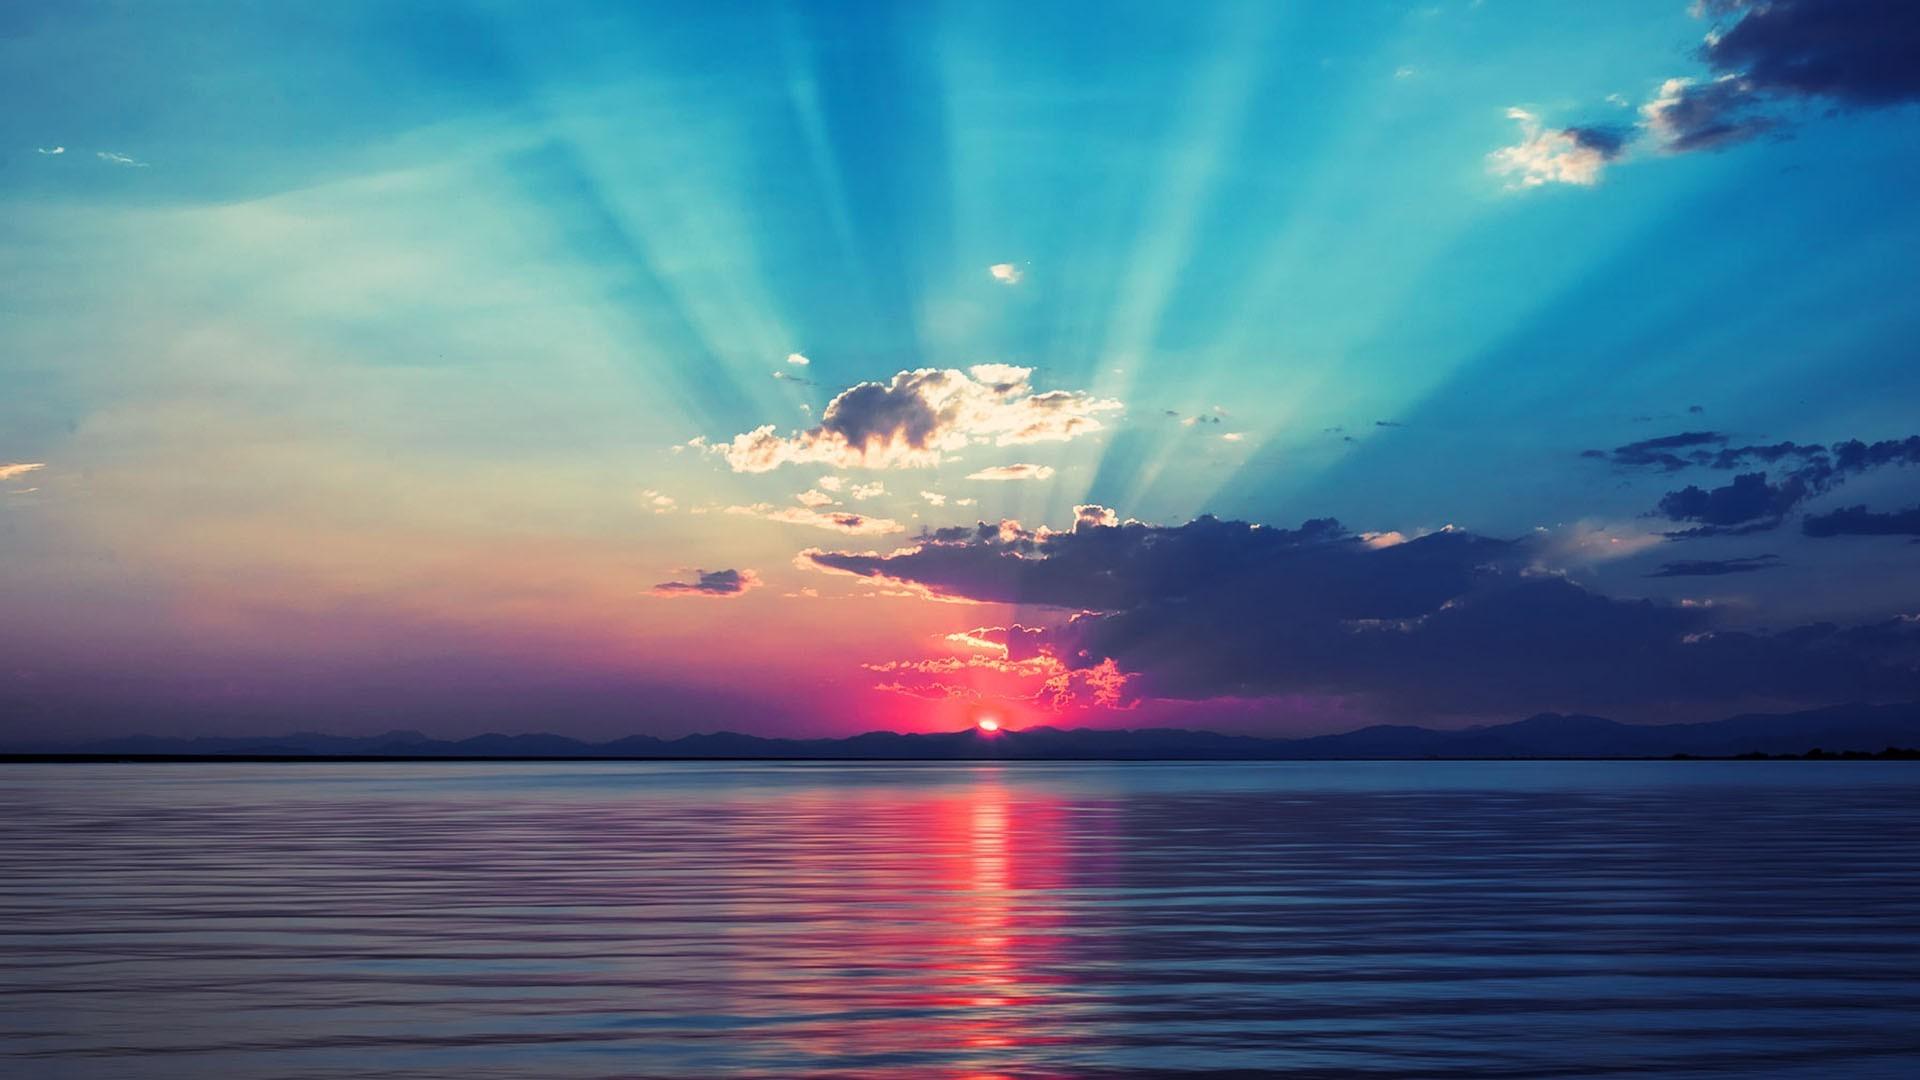 Beautiful Sunrise   Wallpaper High Definition High Quality 1920x1080